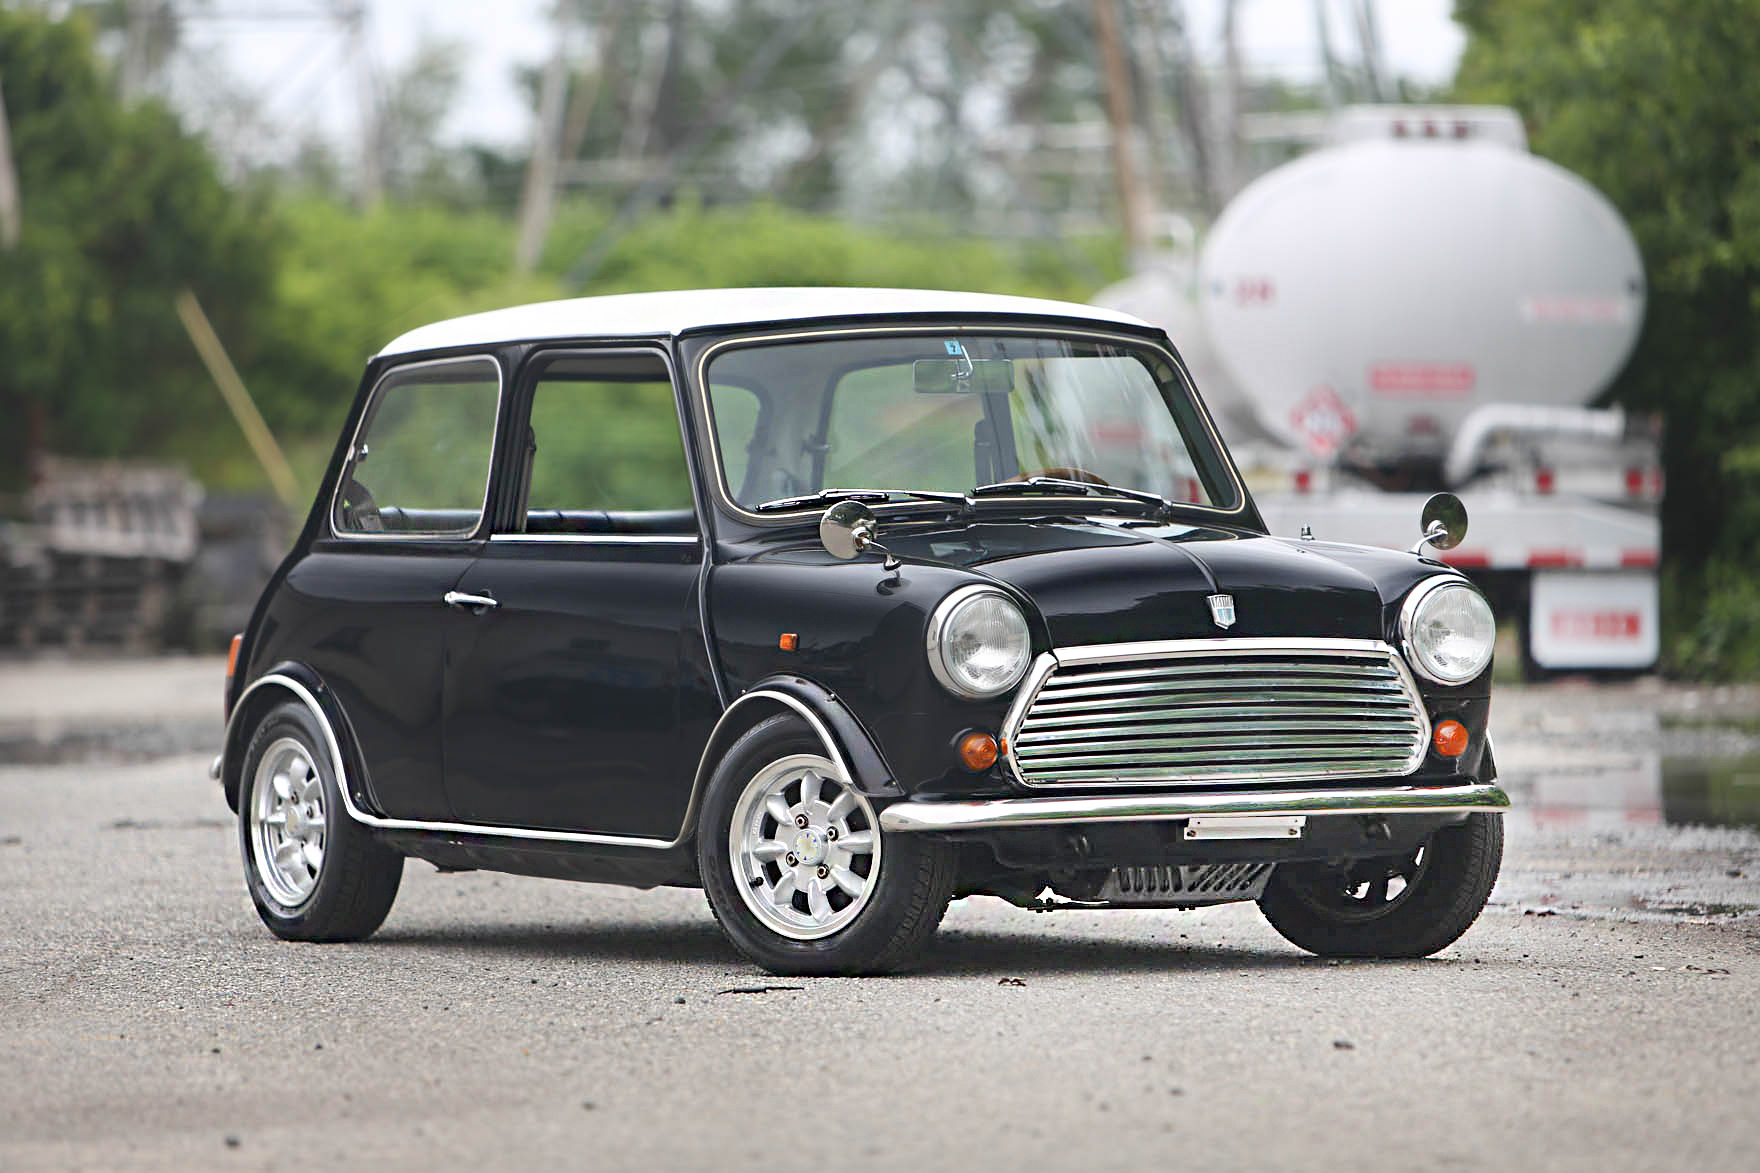 1989 Austin Rover Mini - $14,500